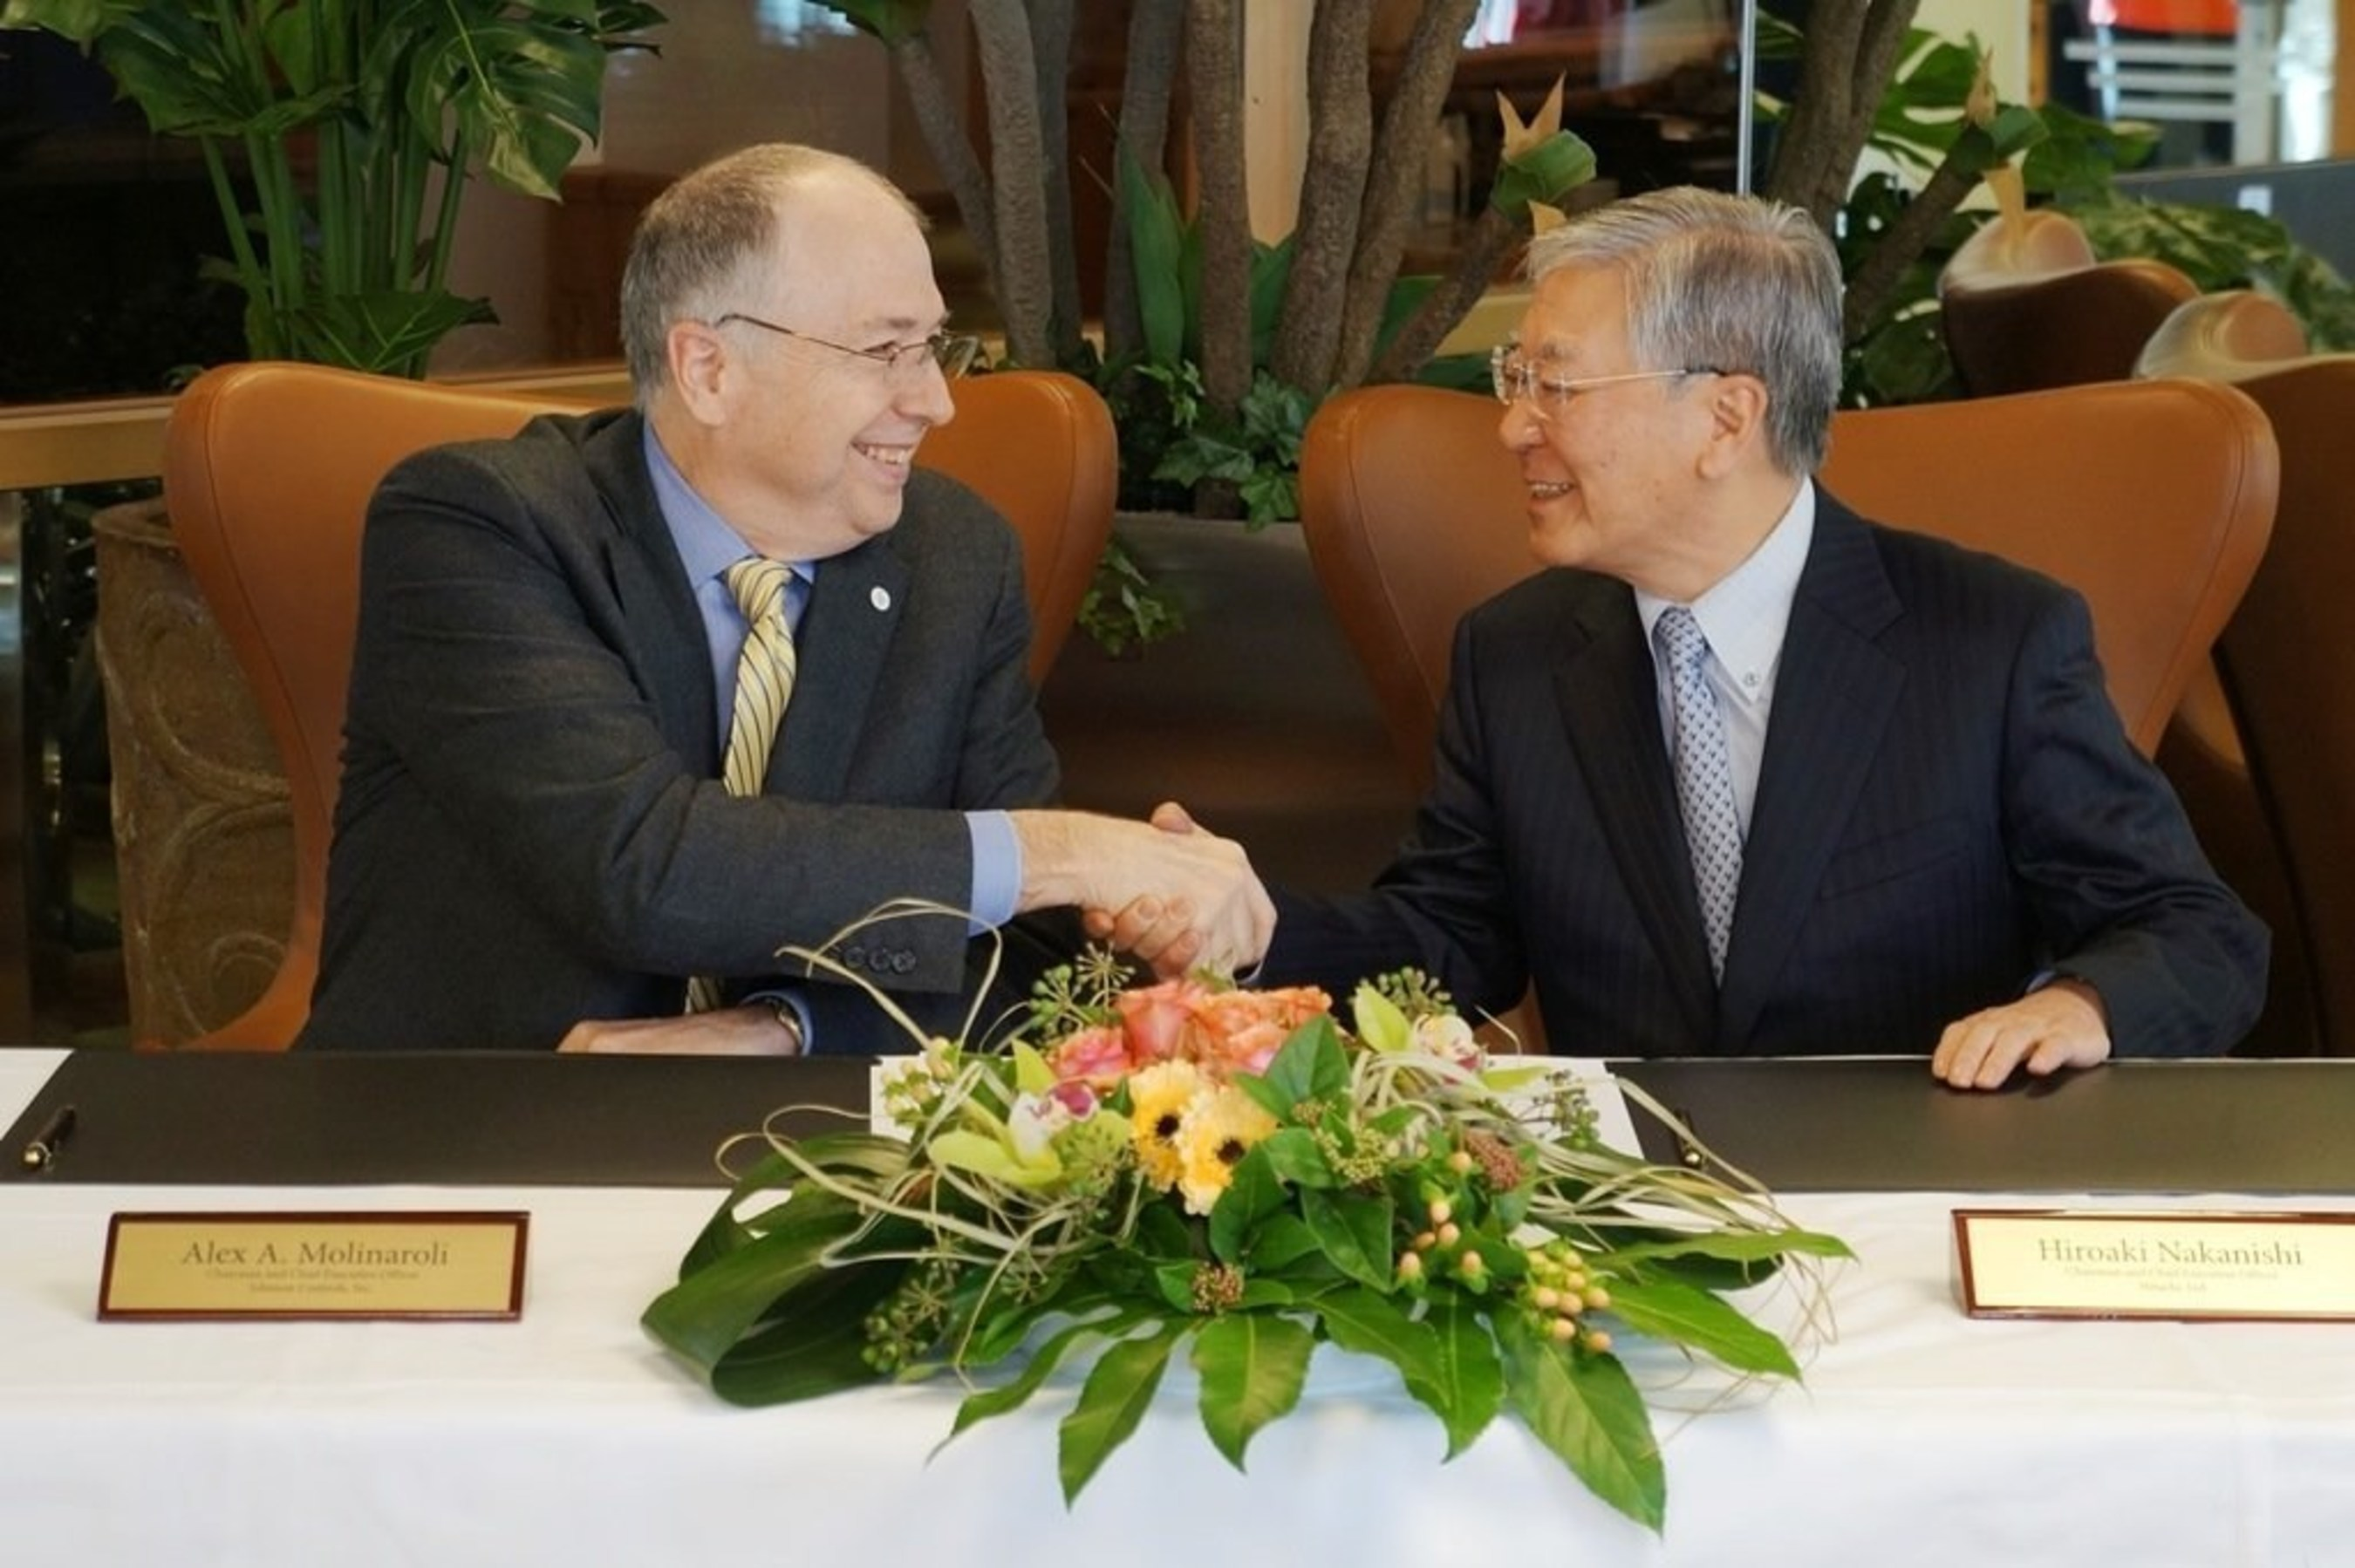 Johnson Controls CEO Alex Molinaroli and Hitachi CEO Hiroaki Nakanishi entered into a joint venture definitive agreement at the World Economic Forum in Davos, Switzerland, on Jan. 21, 2015.